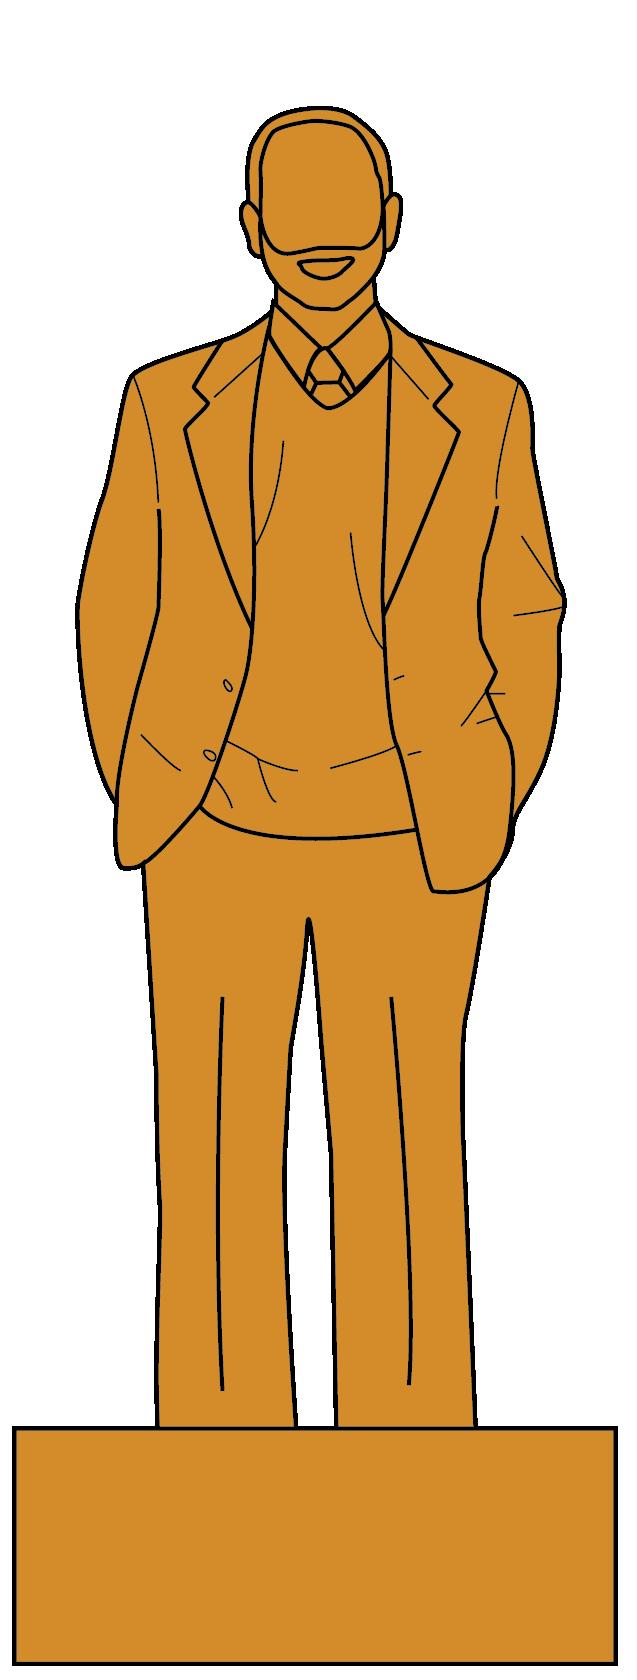 Illustration of a statue of President Morton Schapiro.